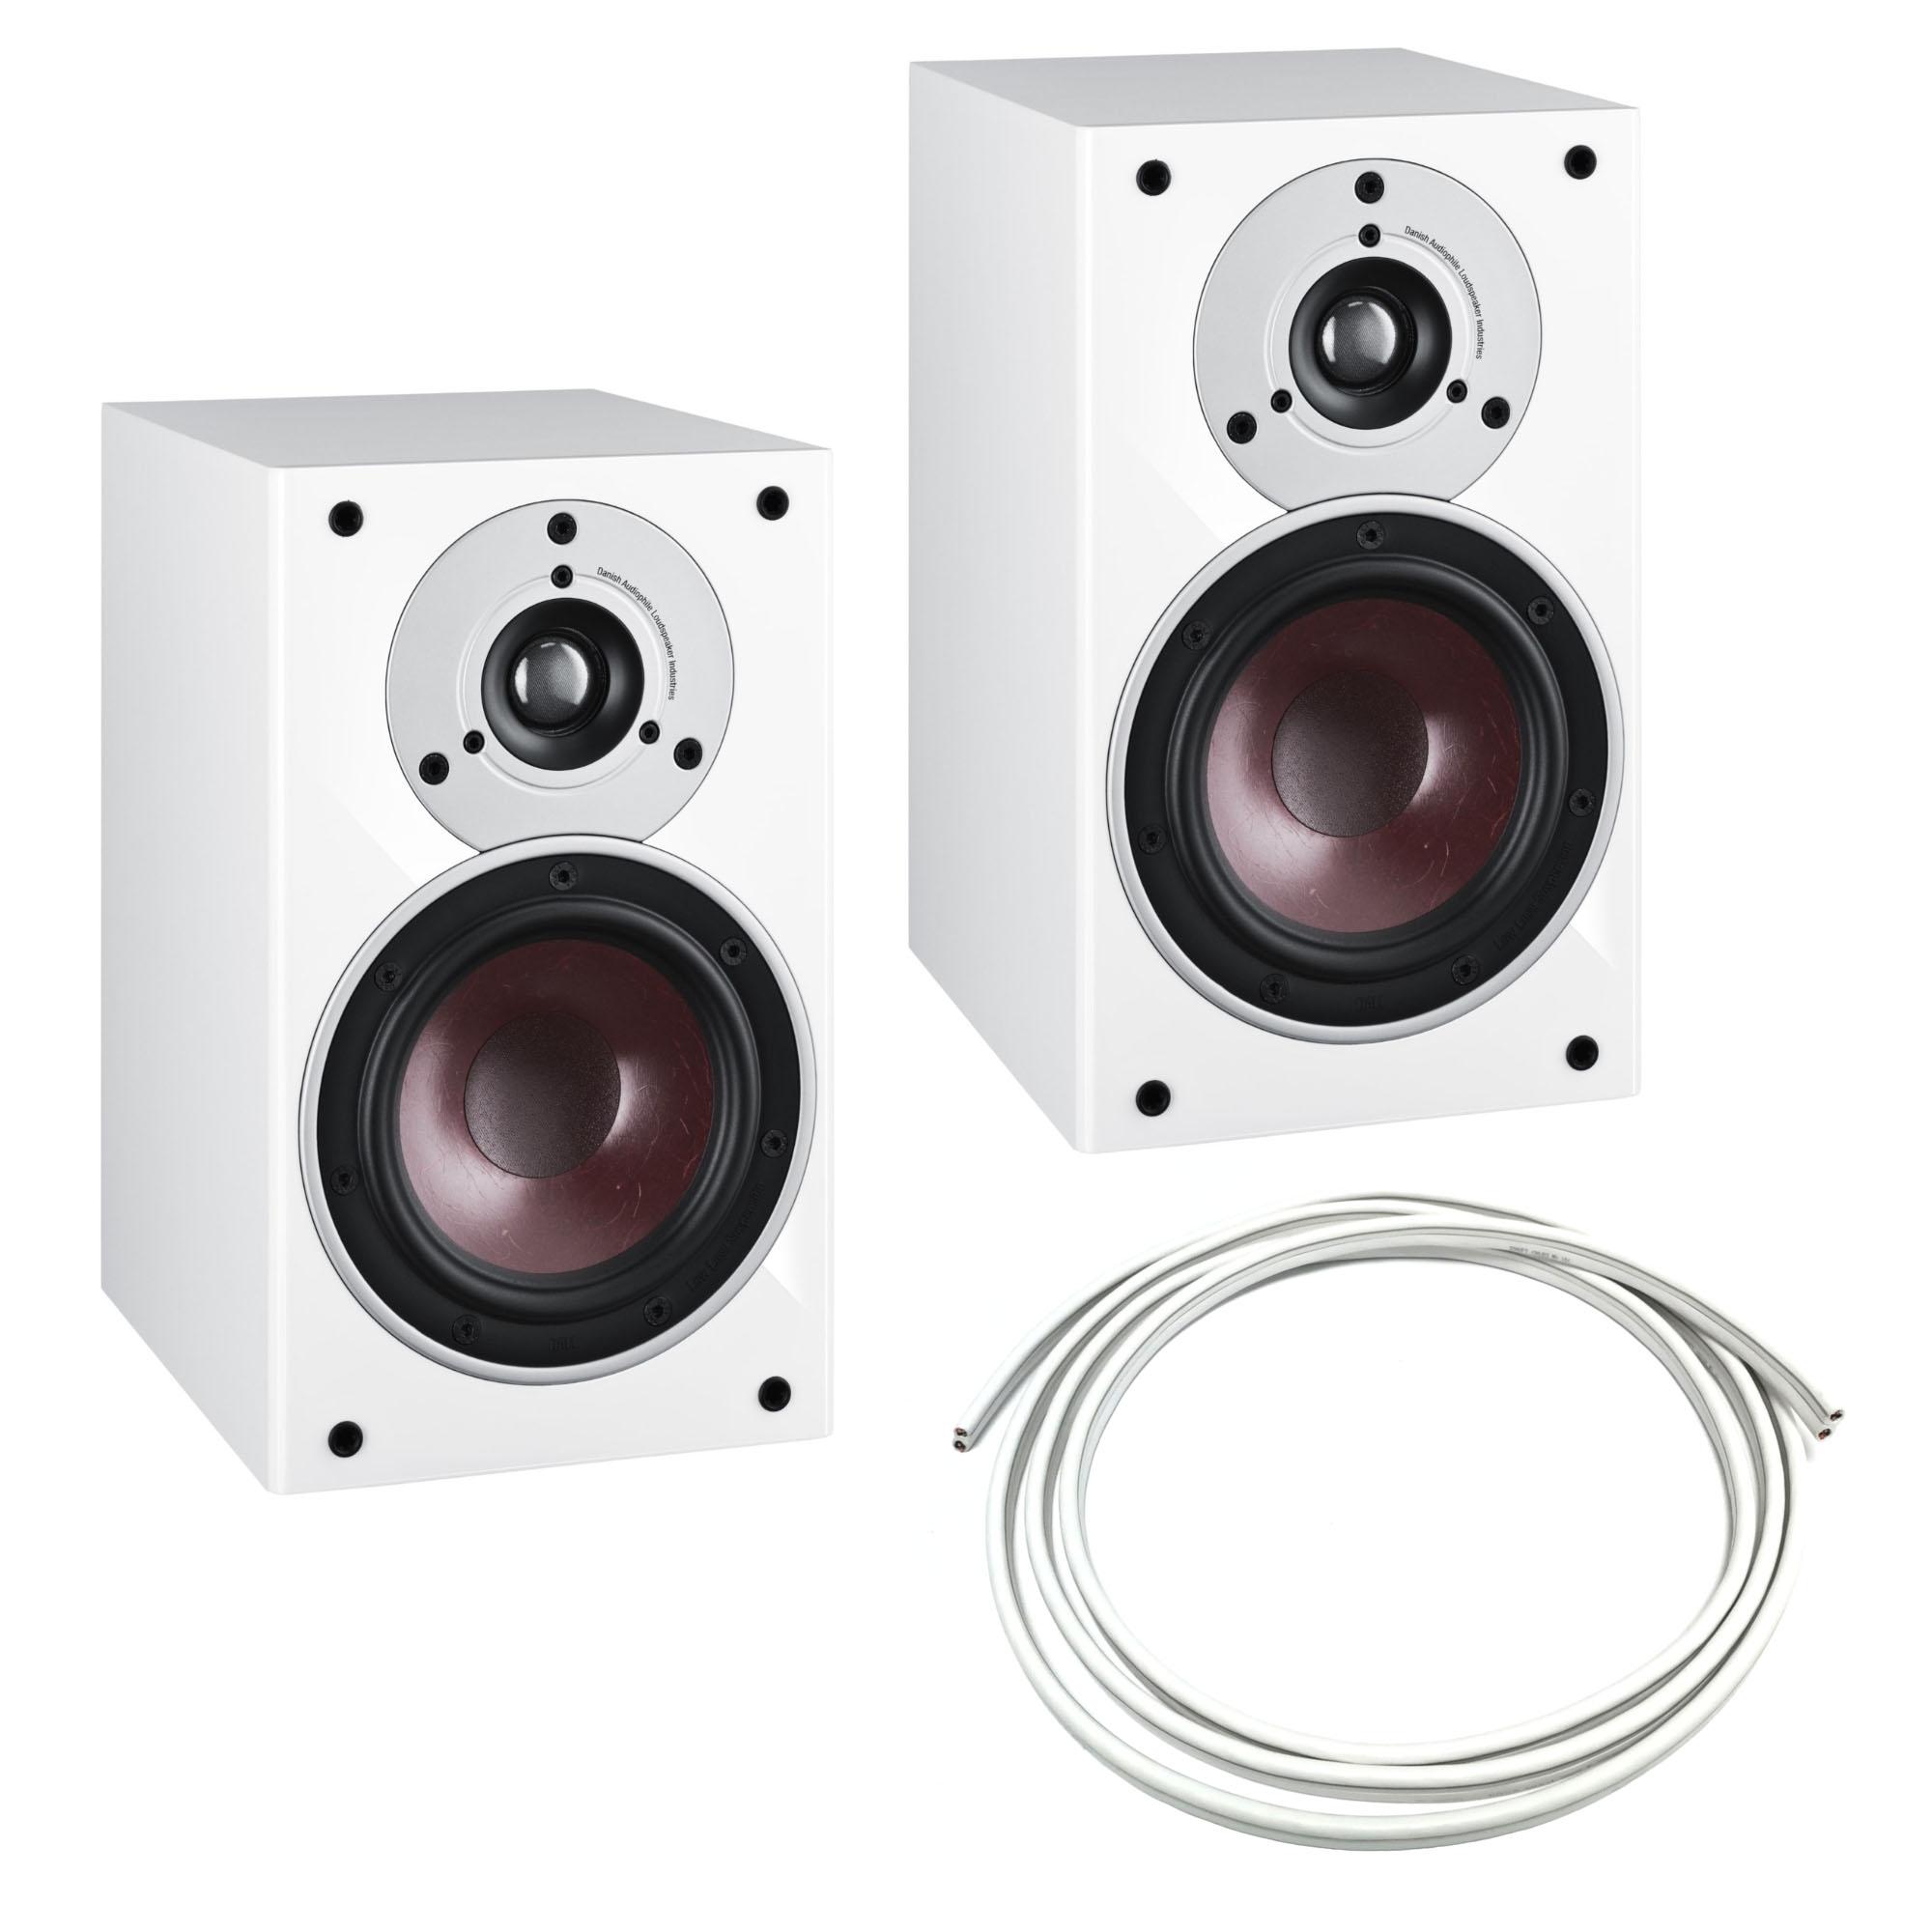 Dali Zensor 1 (Paar, weiß oder walnuss) + Gratis 5m-Audioquest-Lautsprecherkabel